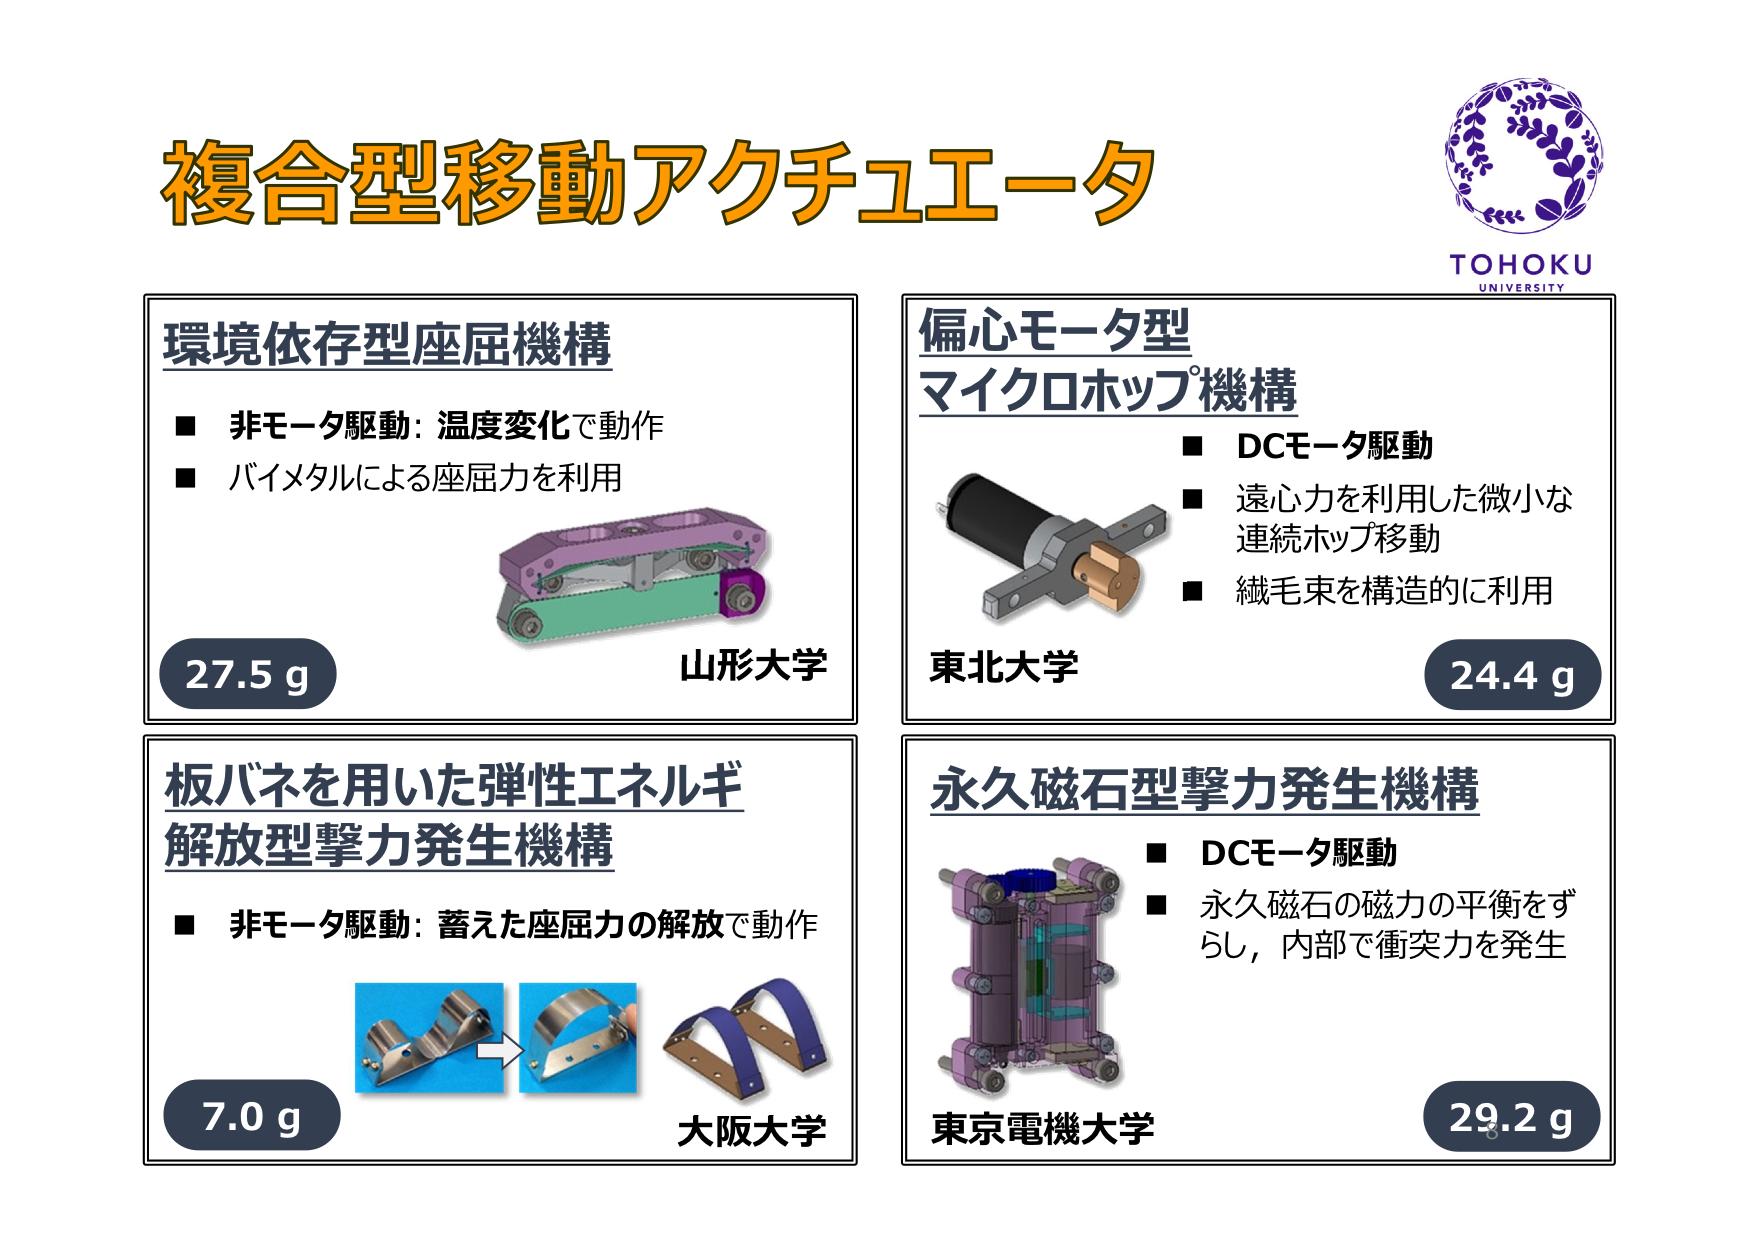 f:id:Imamura:20190924122724p:plain